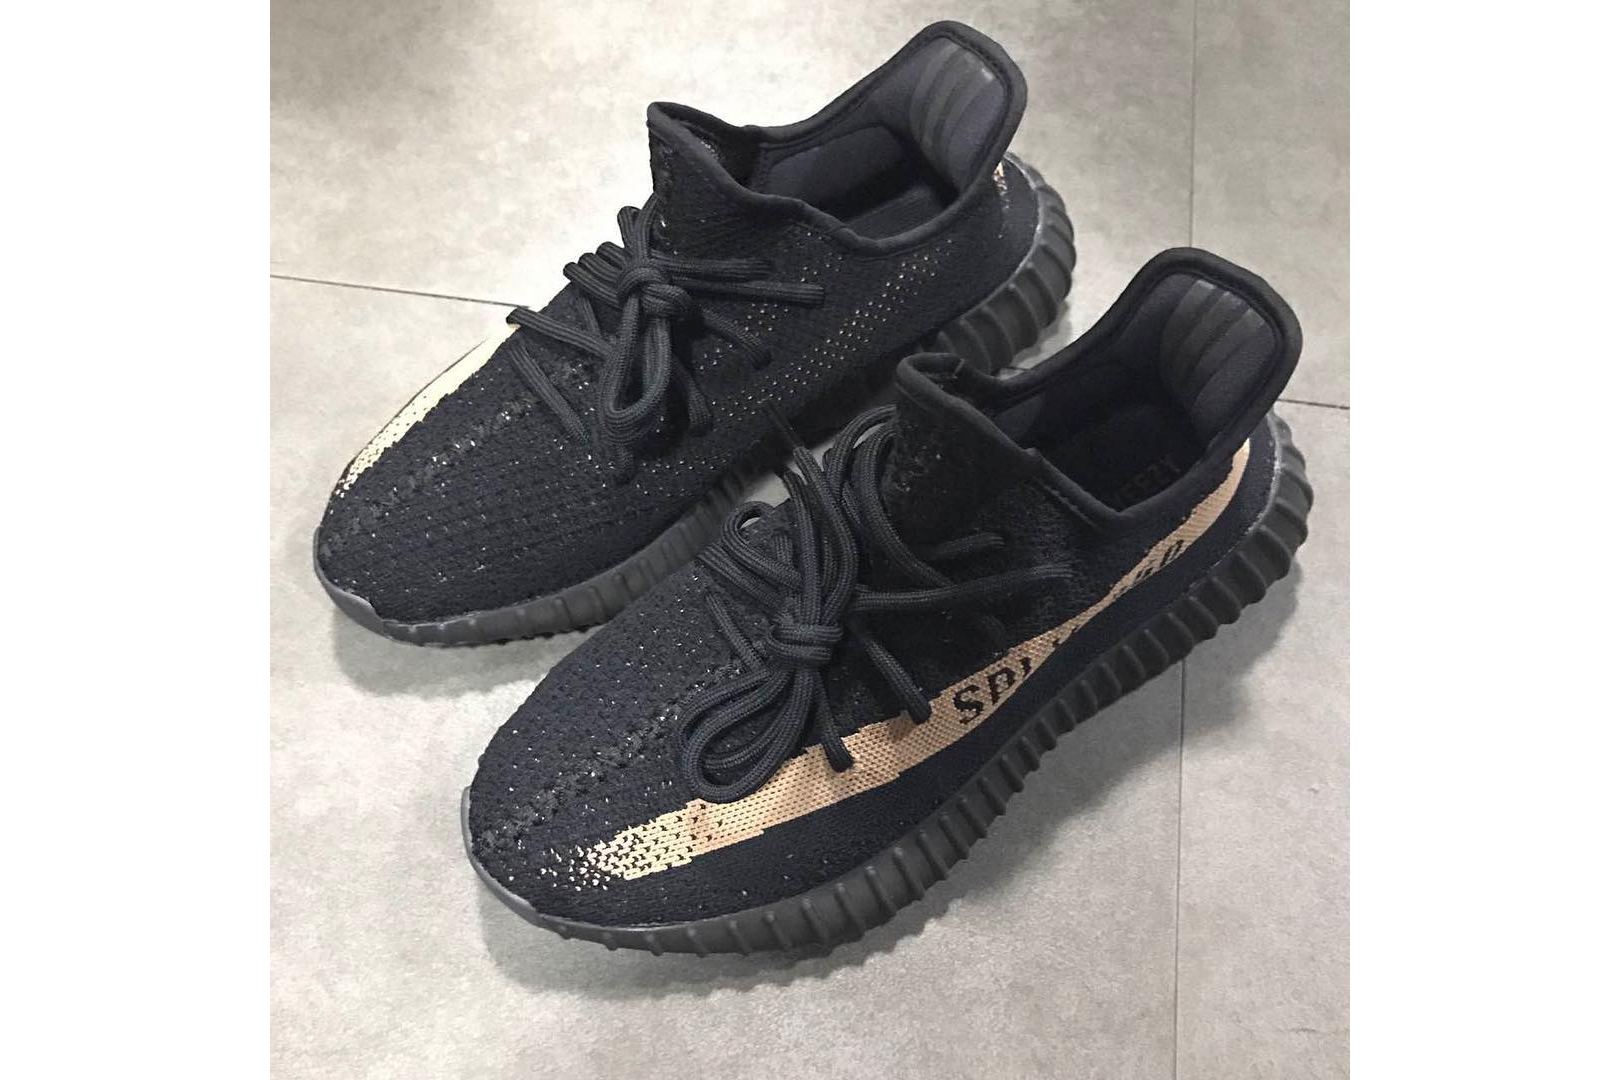 adidas Yeezy Boost 350 V2 Black Friday Kanye West - 1766437